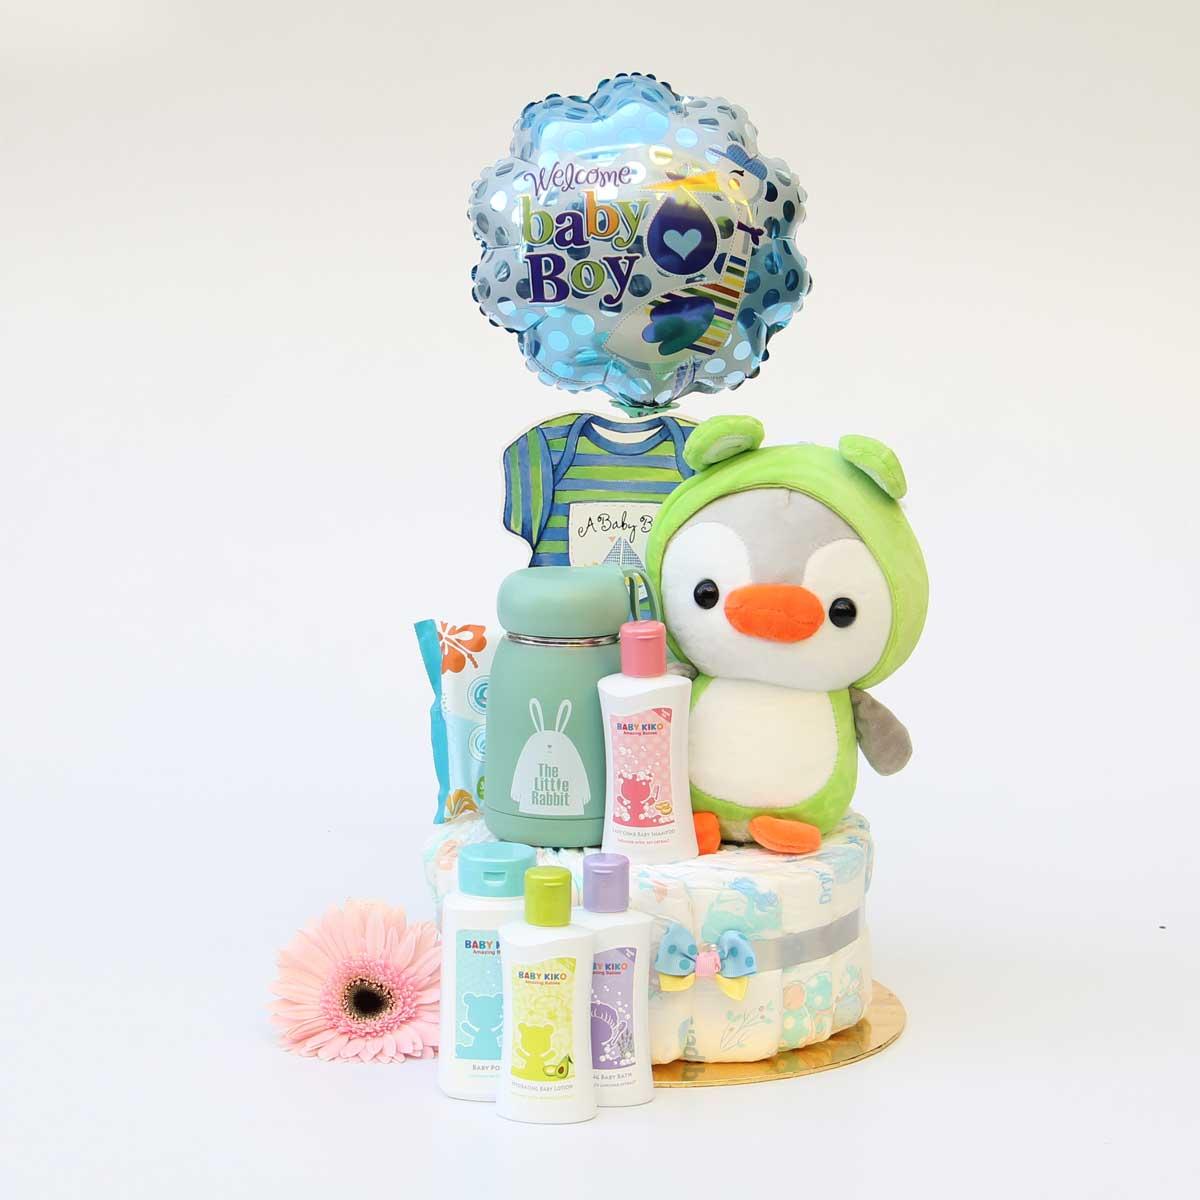 Baby Bath Diaper Cake | Newborn Baby Gifts | Eska Creative Gifting